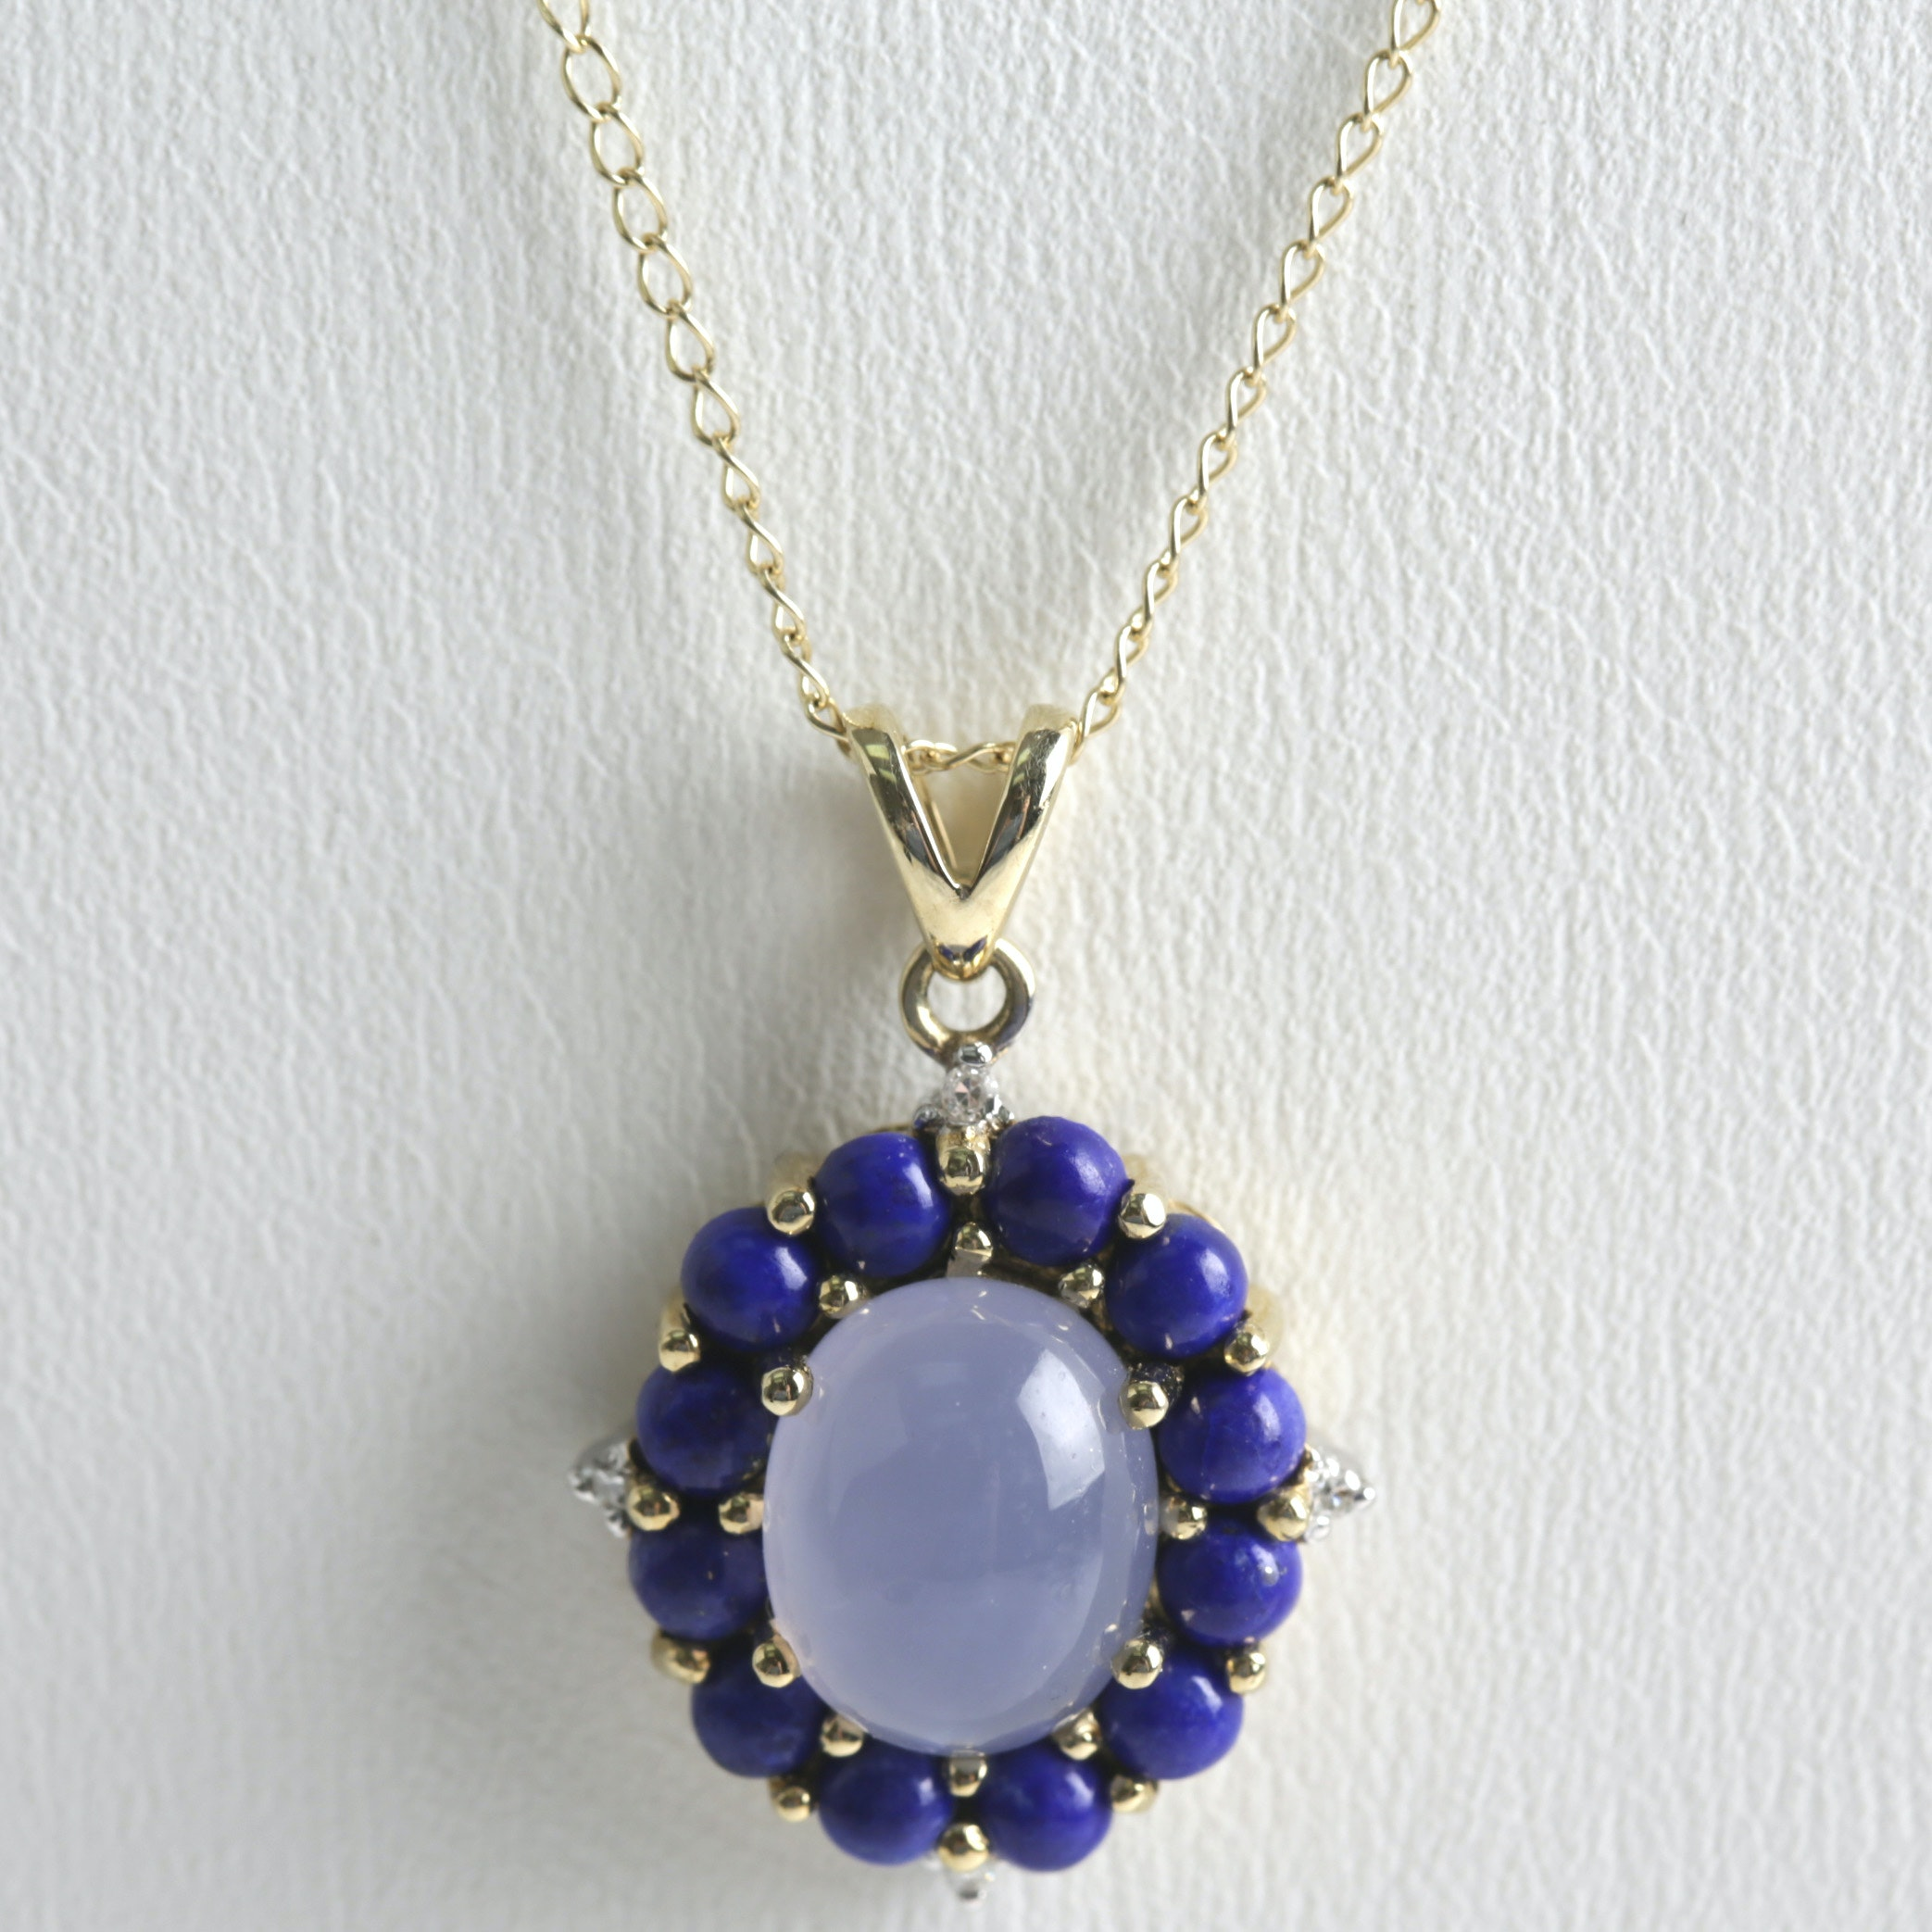 14K Yellow Gold Moonstone, Lapis Lazuli, and Diamond Necklace